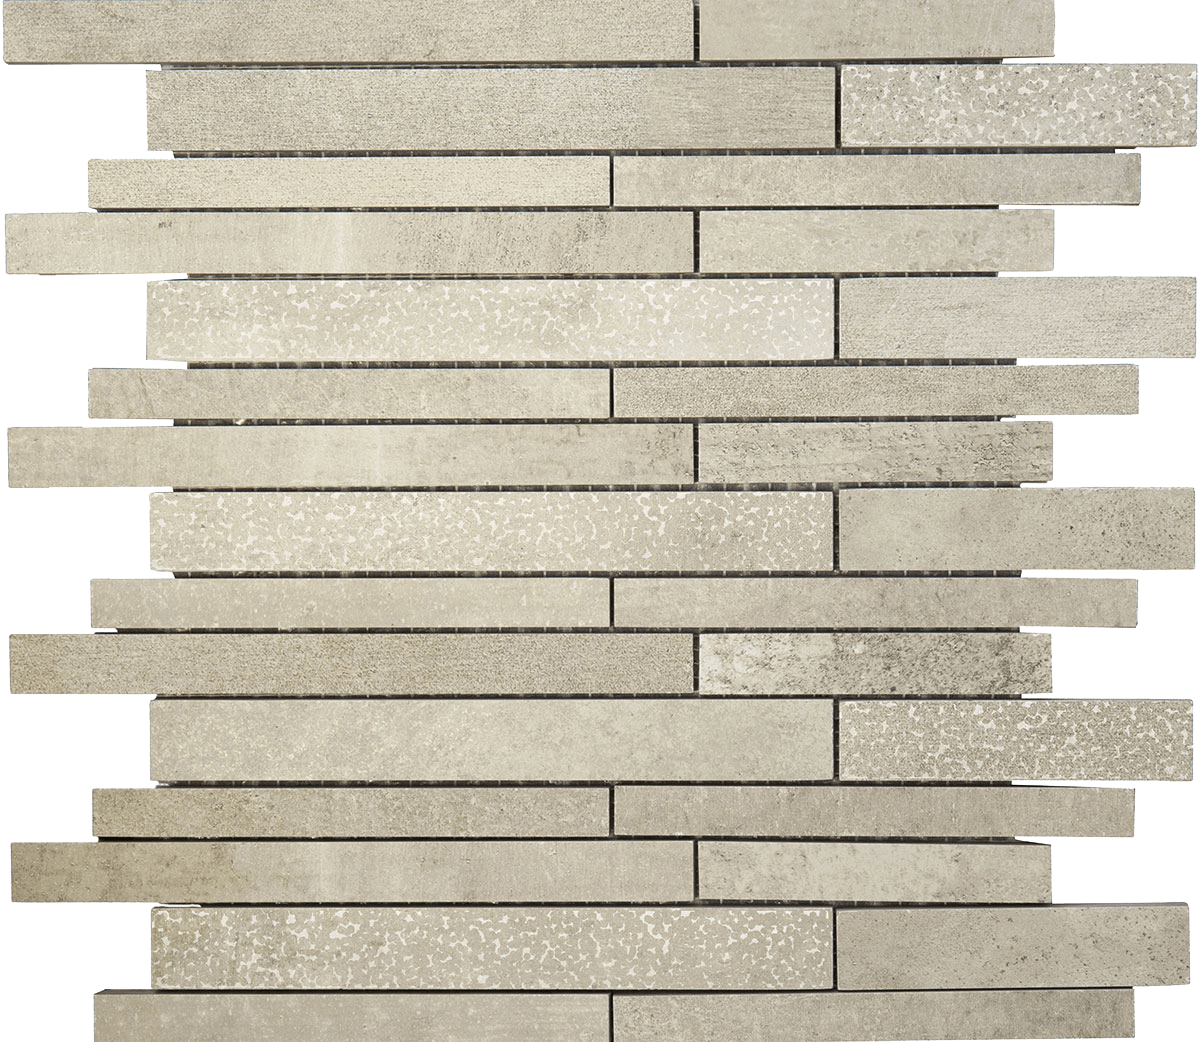 TRITON 29,7 x 29,7 grey anpoliert /Mauerverband Image